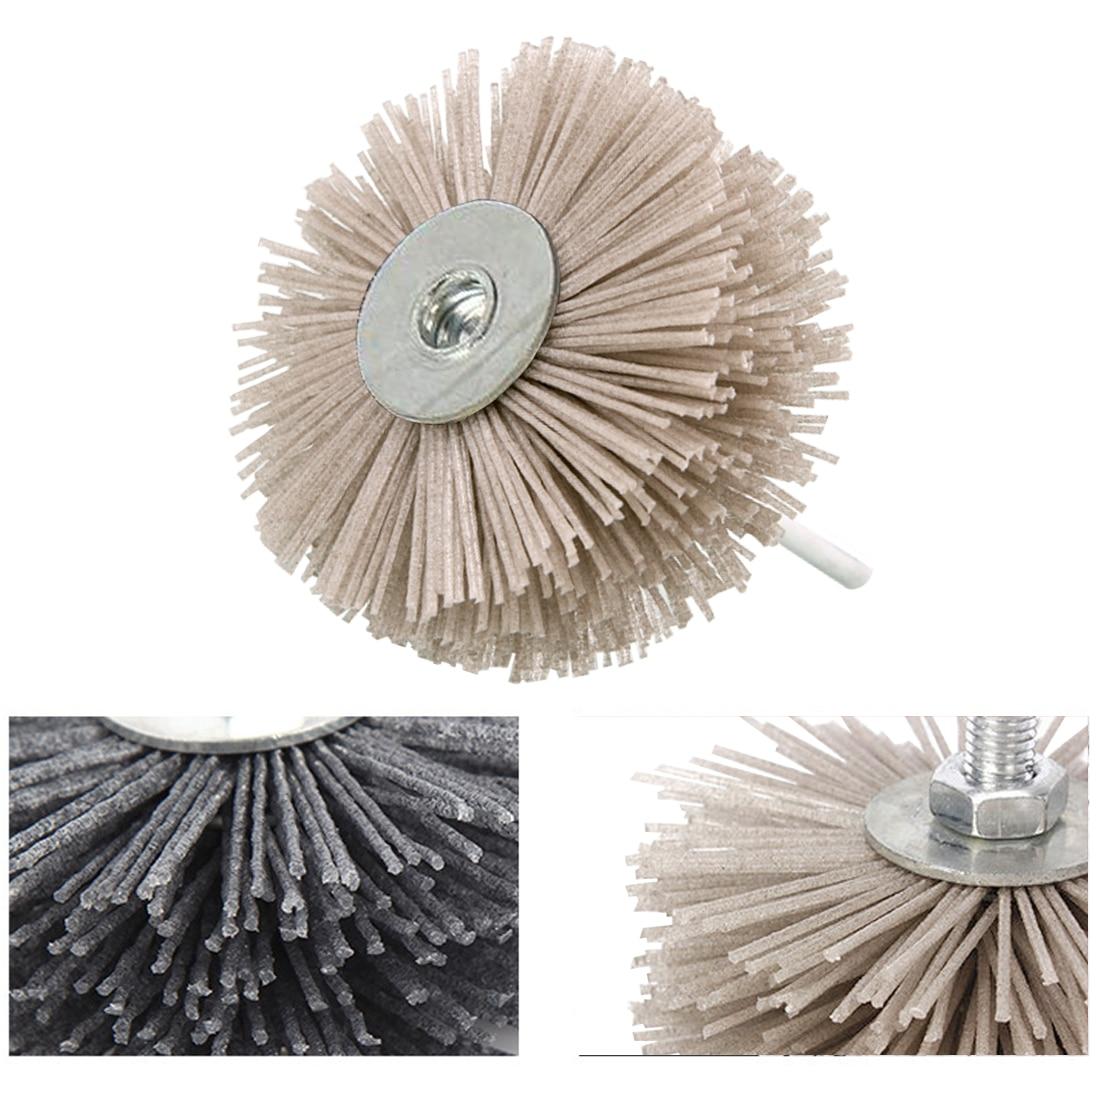 Nylon Material Wood Thuja Redwood Root Relief Polishing Wheel Grinding Head Wear-resistant Brush Grinding Head Abrasive